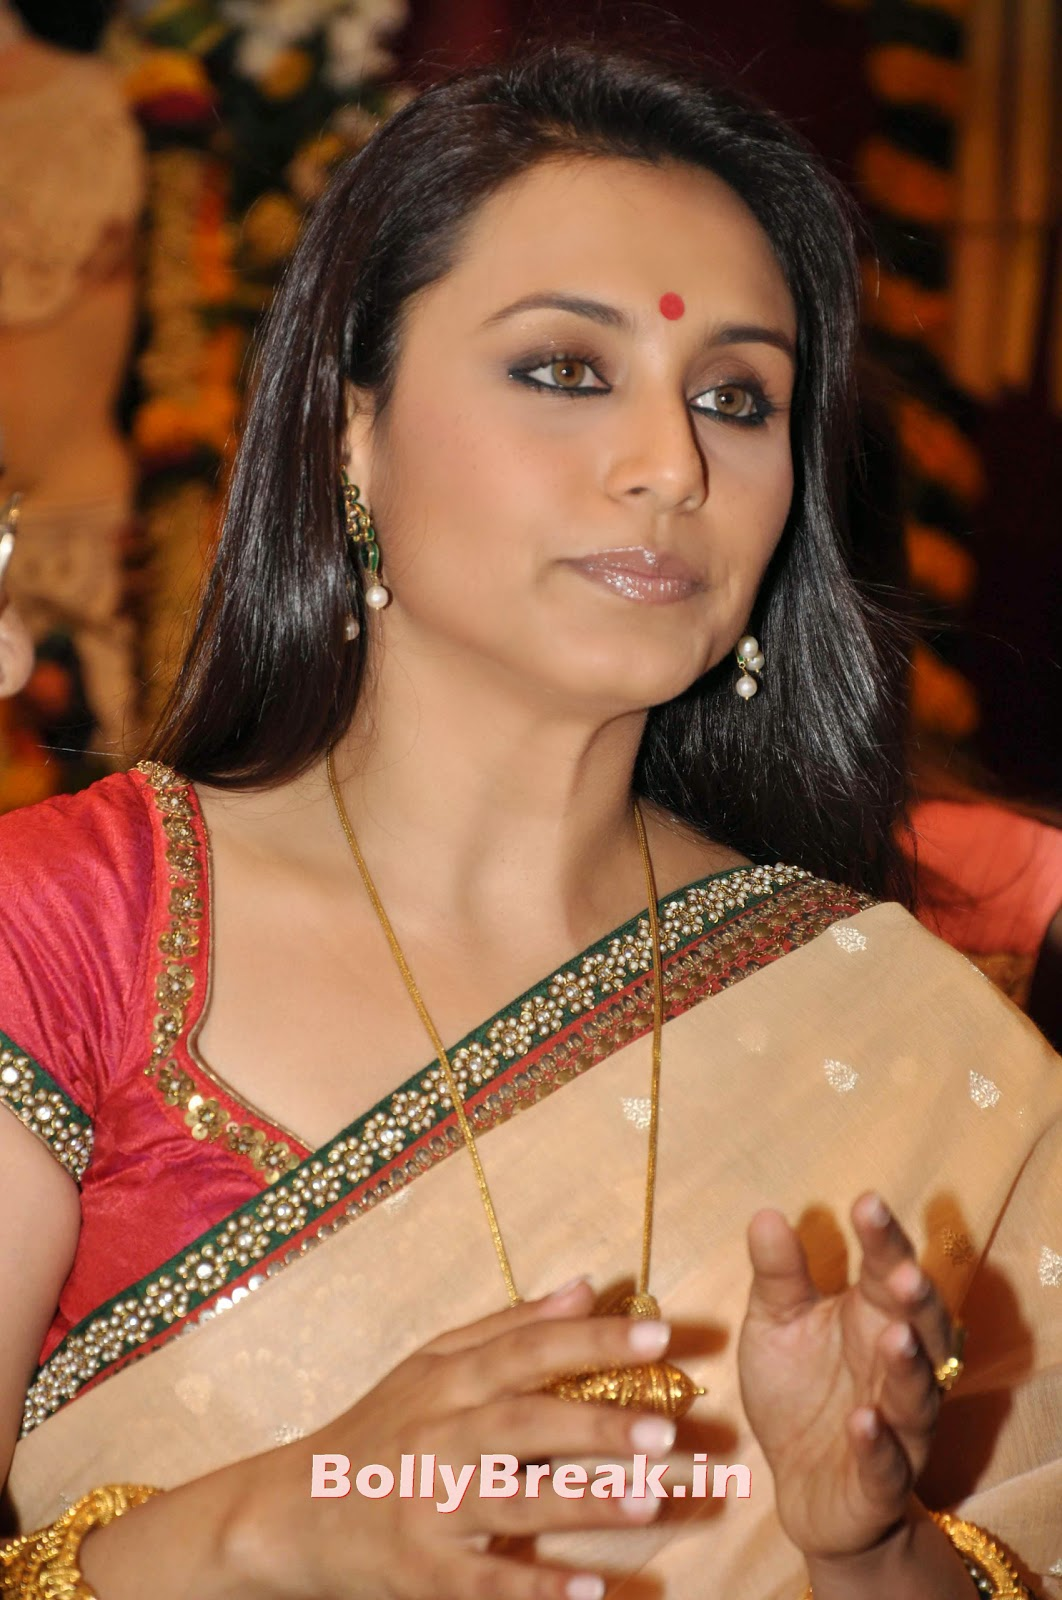 Rani Mukherjee Bengali Saree Hot Pics In Hd - 5 Pics-5837